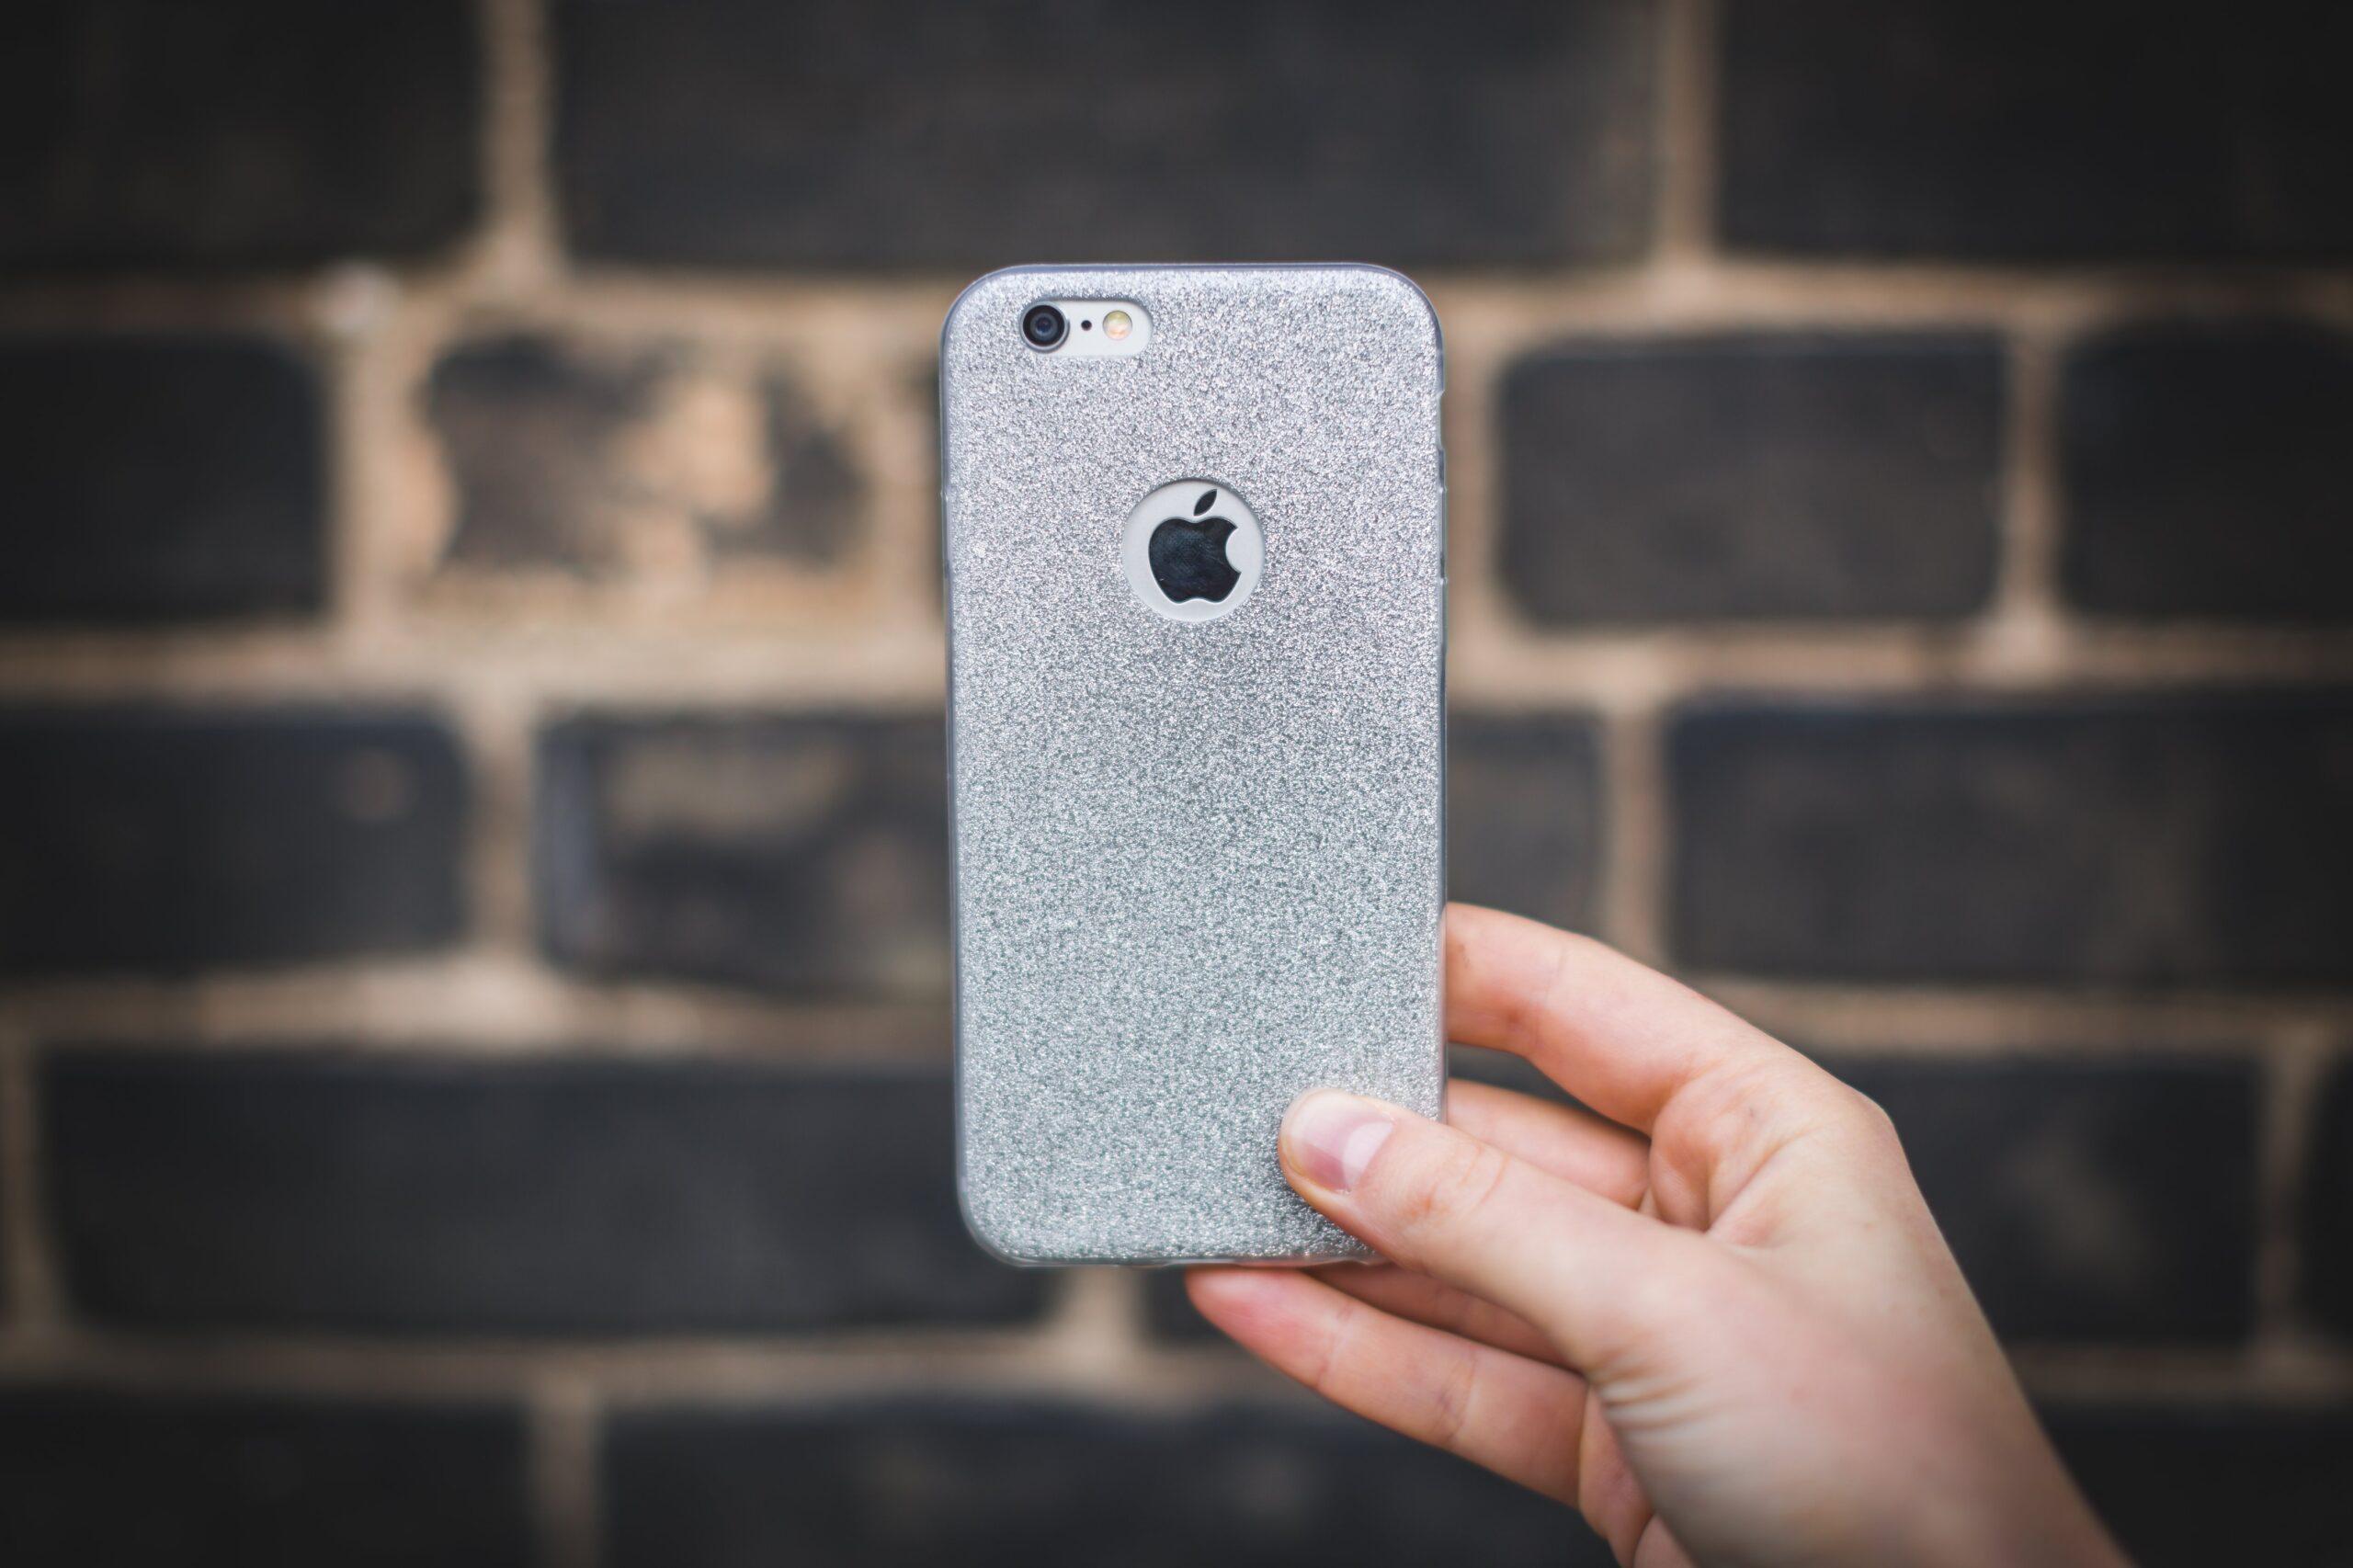 Ориентировочная дата запуска Apple Pay в банках Беларуси – 20 сентября